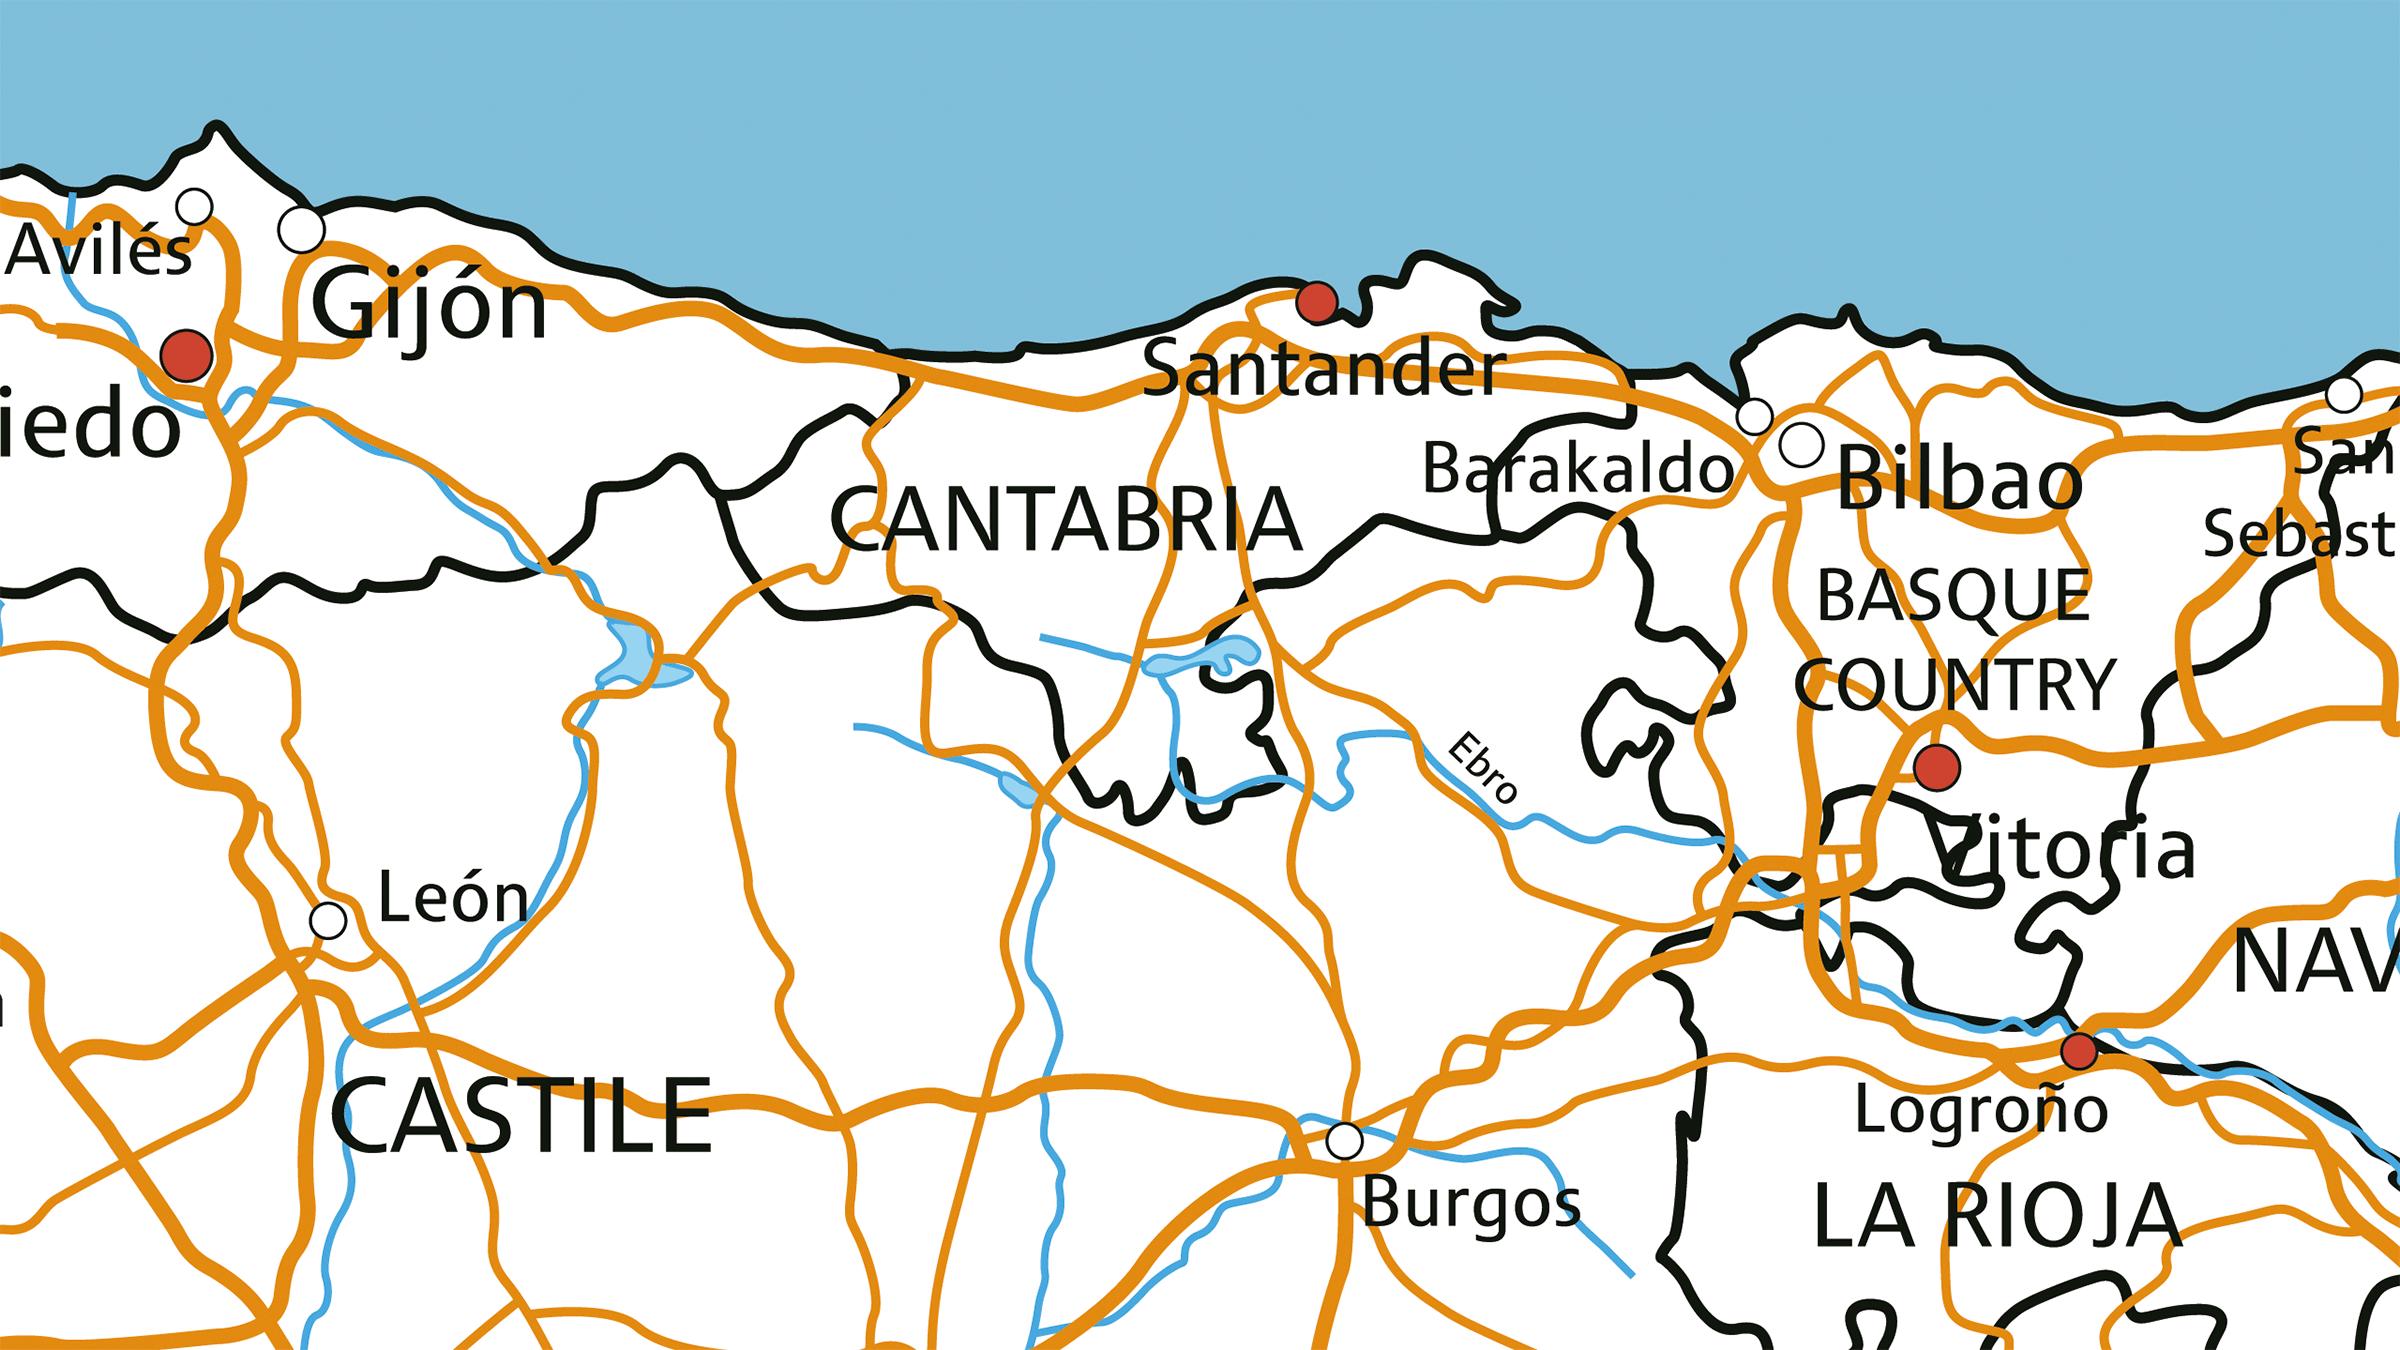 Mapa de las carreteras de Cantabria